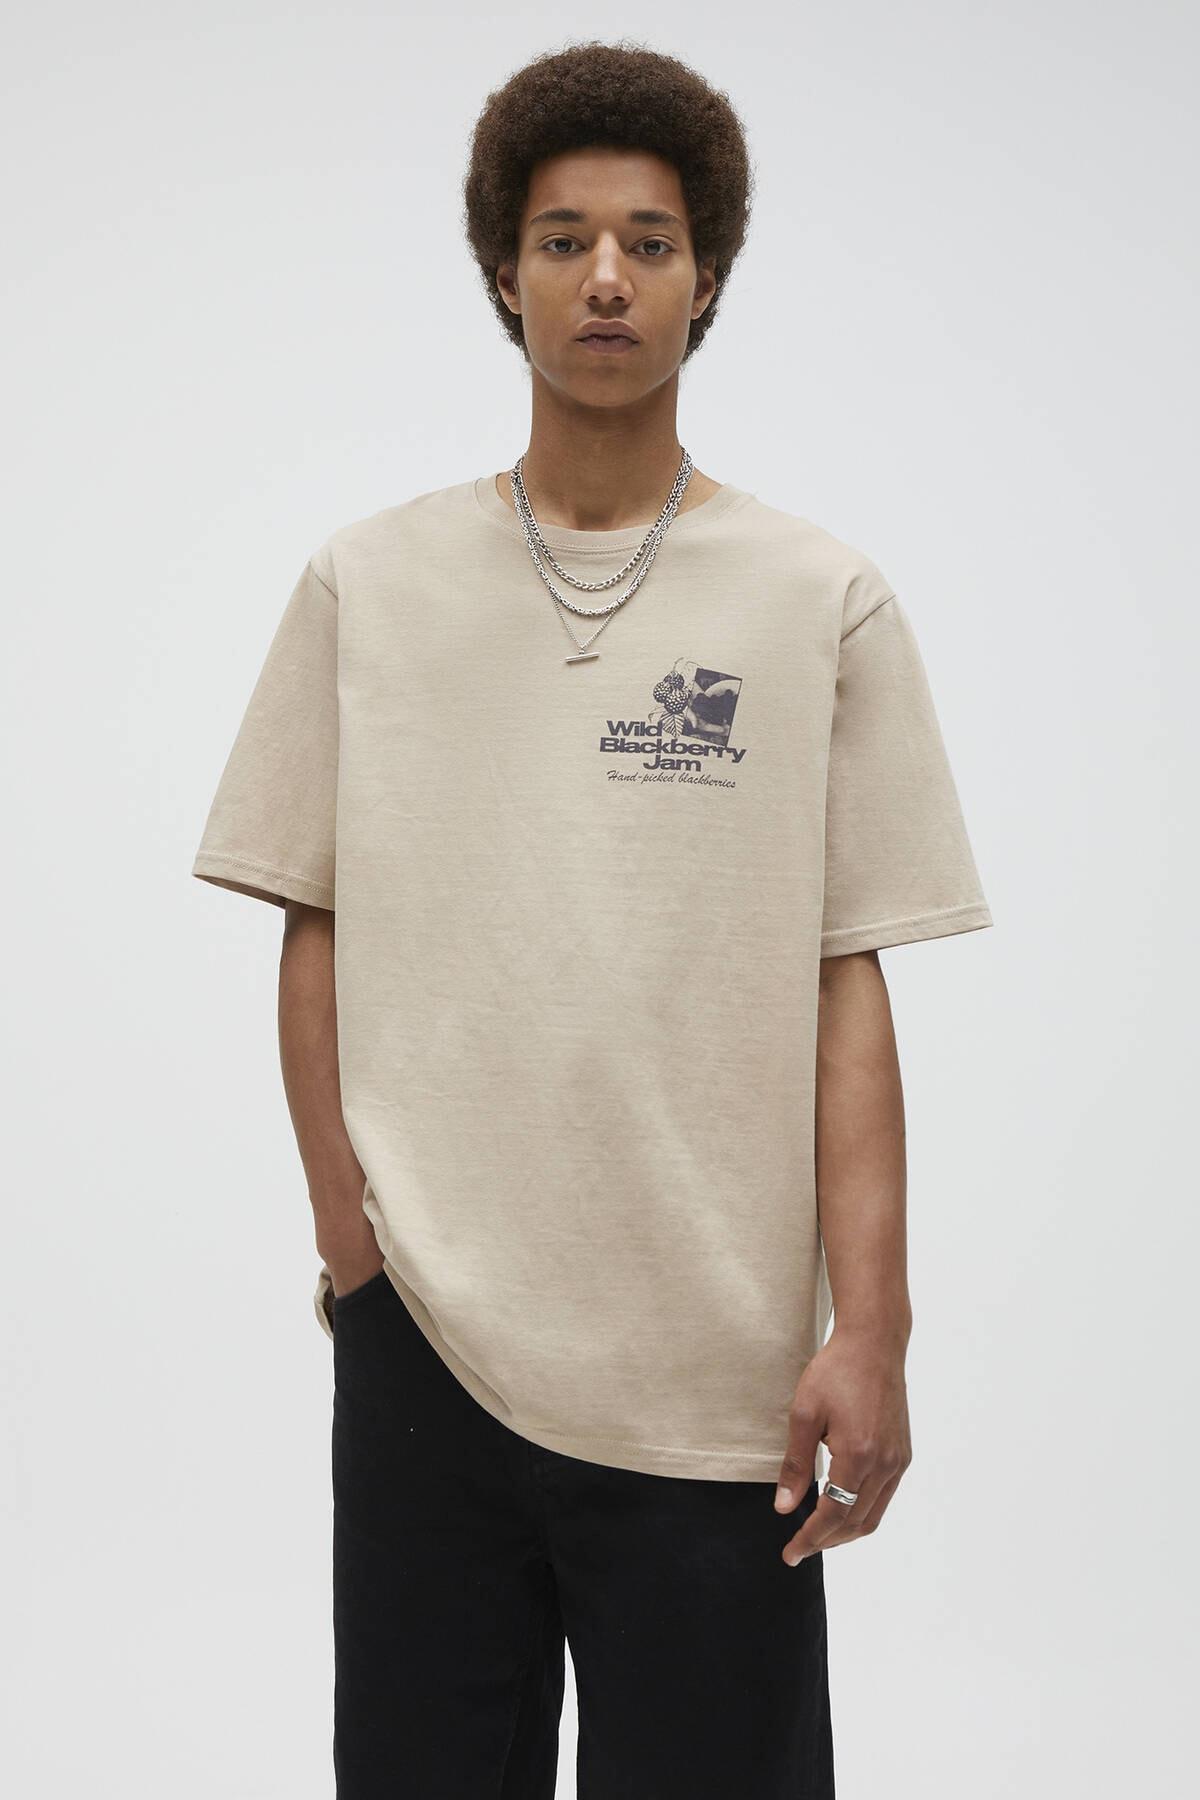 Pull & Bear Kum Rengi Beyaz Stwd Logolu T-Shirt - En Az %50 Organik Pamuklu 04241552